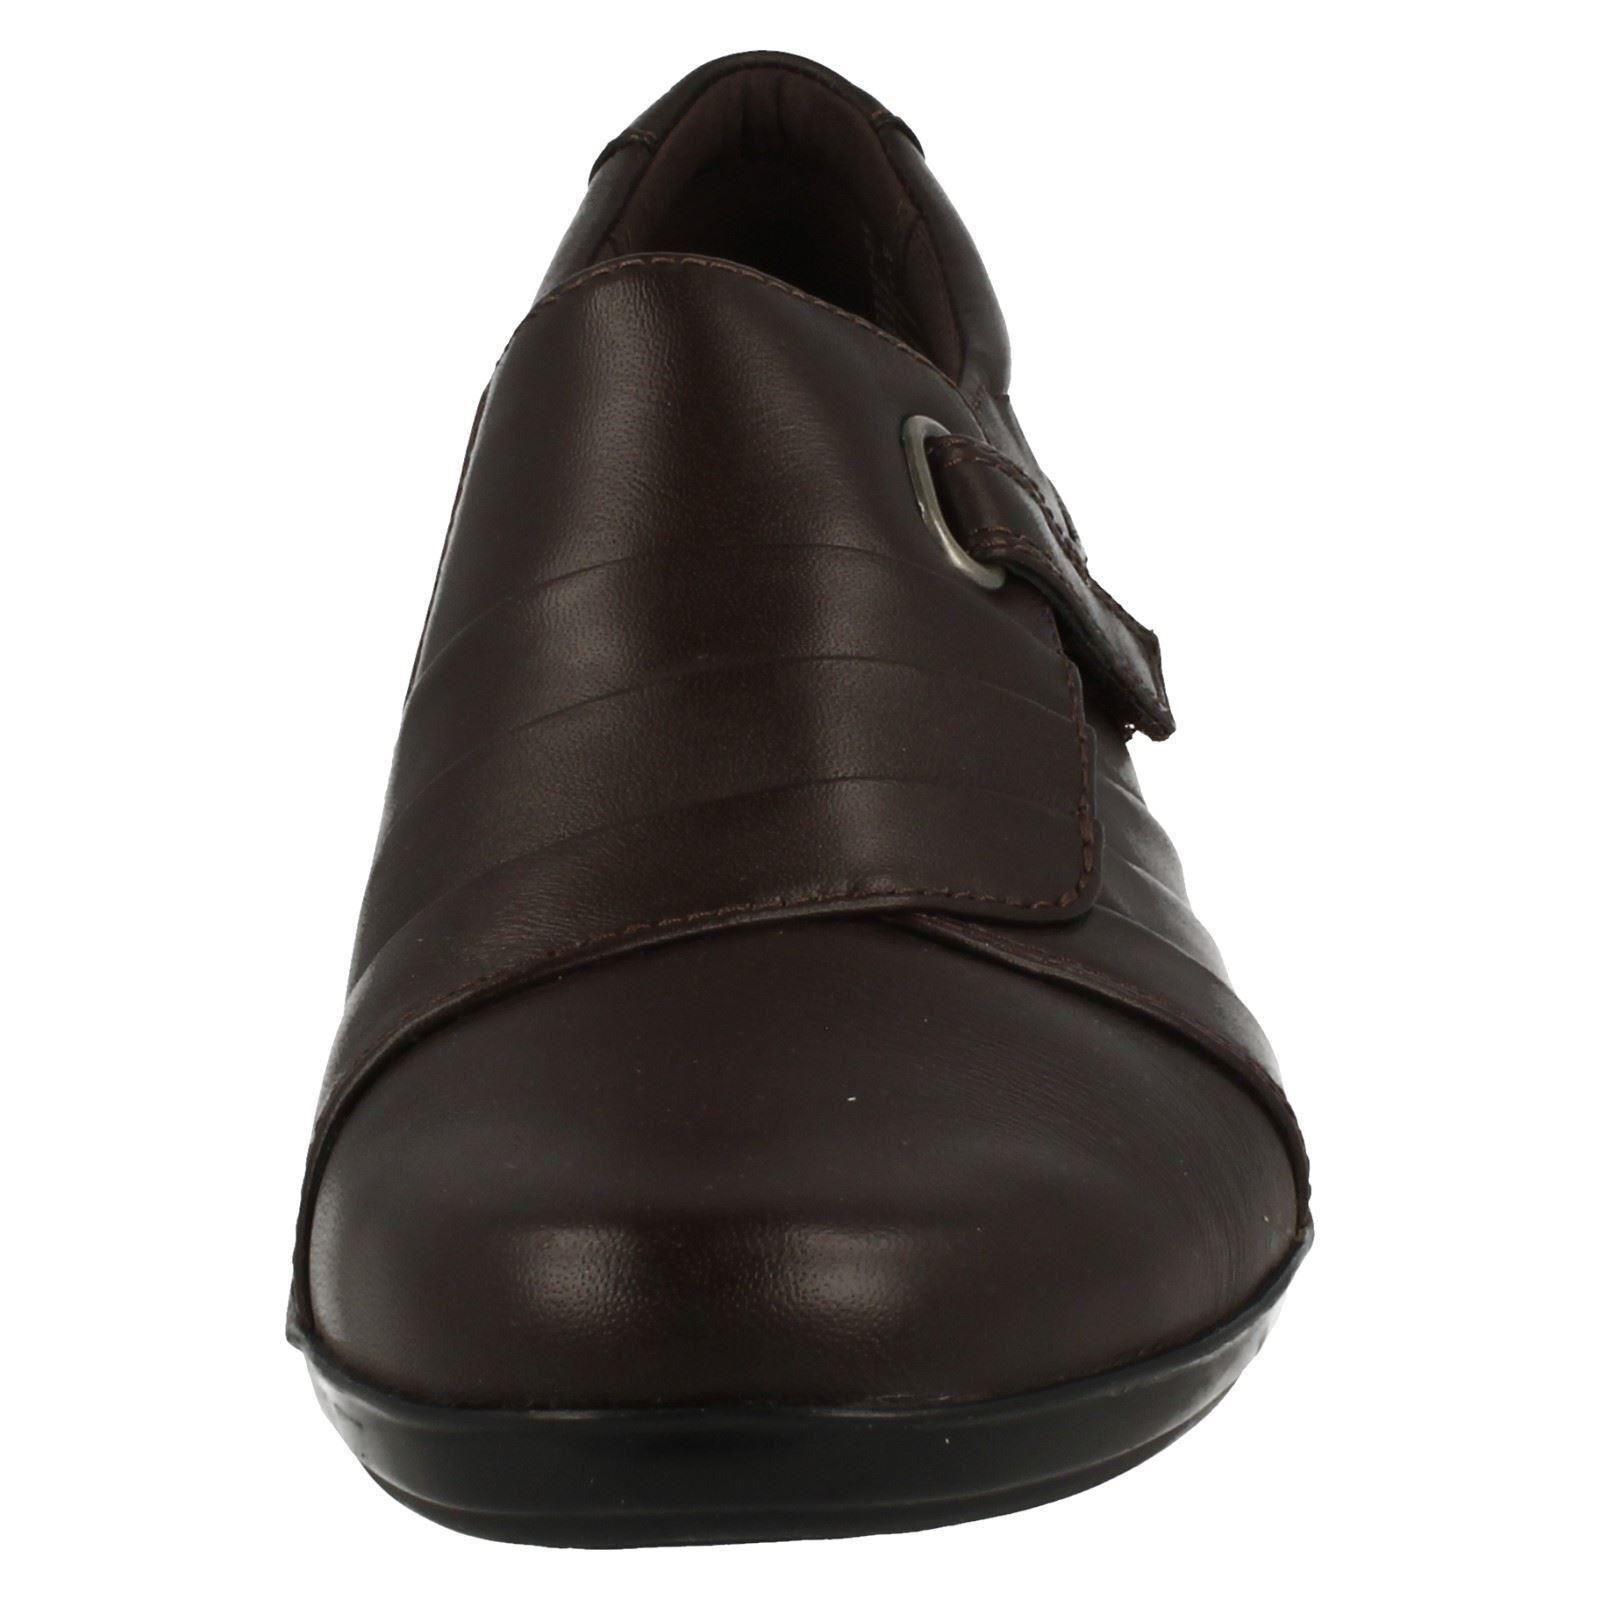 Damen Schwarz/ Stirn Leder Clarks Hose Schuhe 9 UK Größen 4 - 9 Schuhe Everlay Luna 5947df